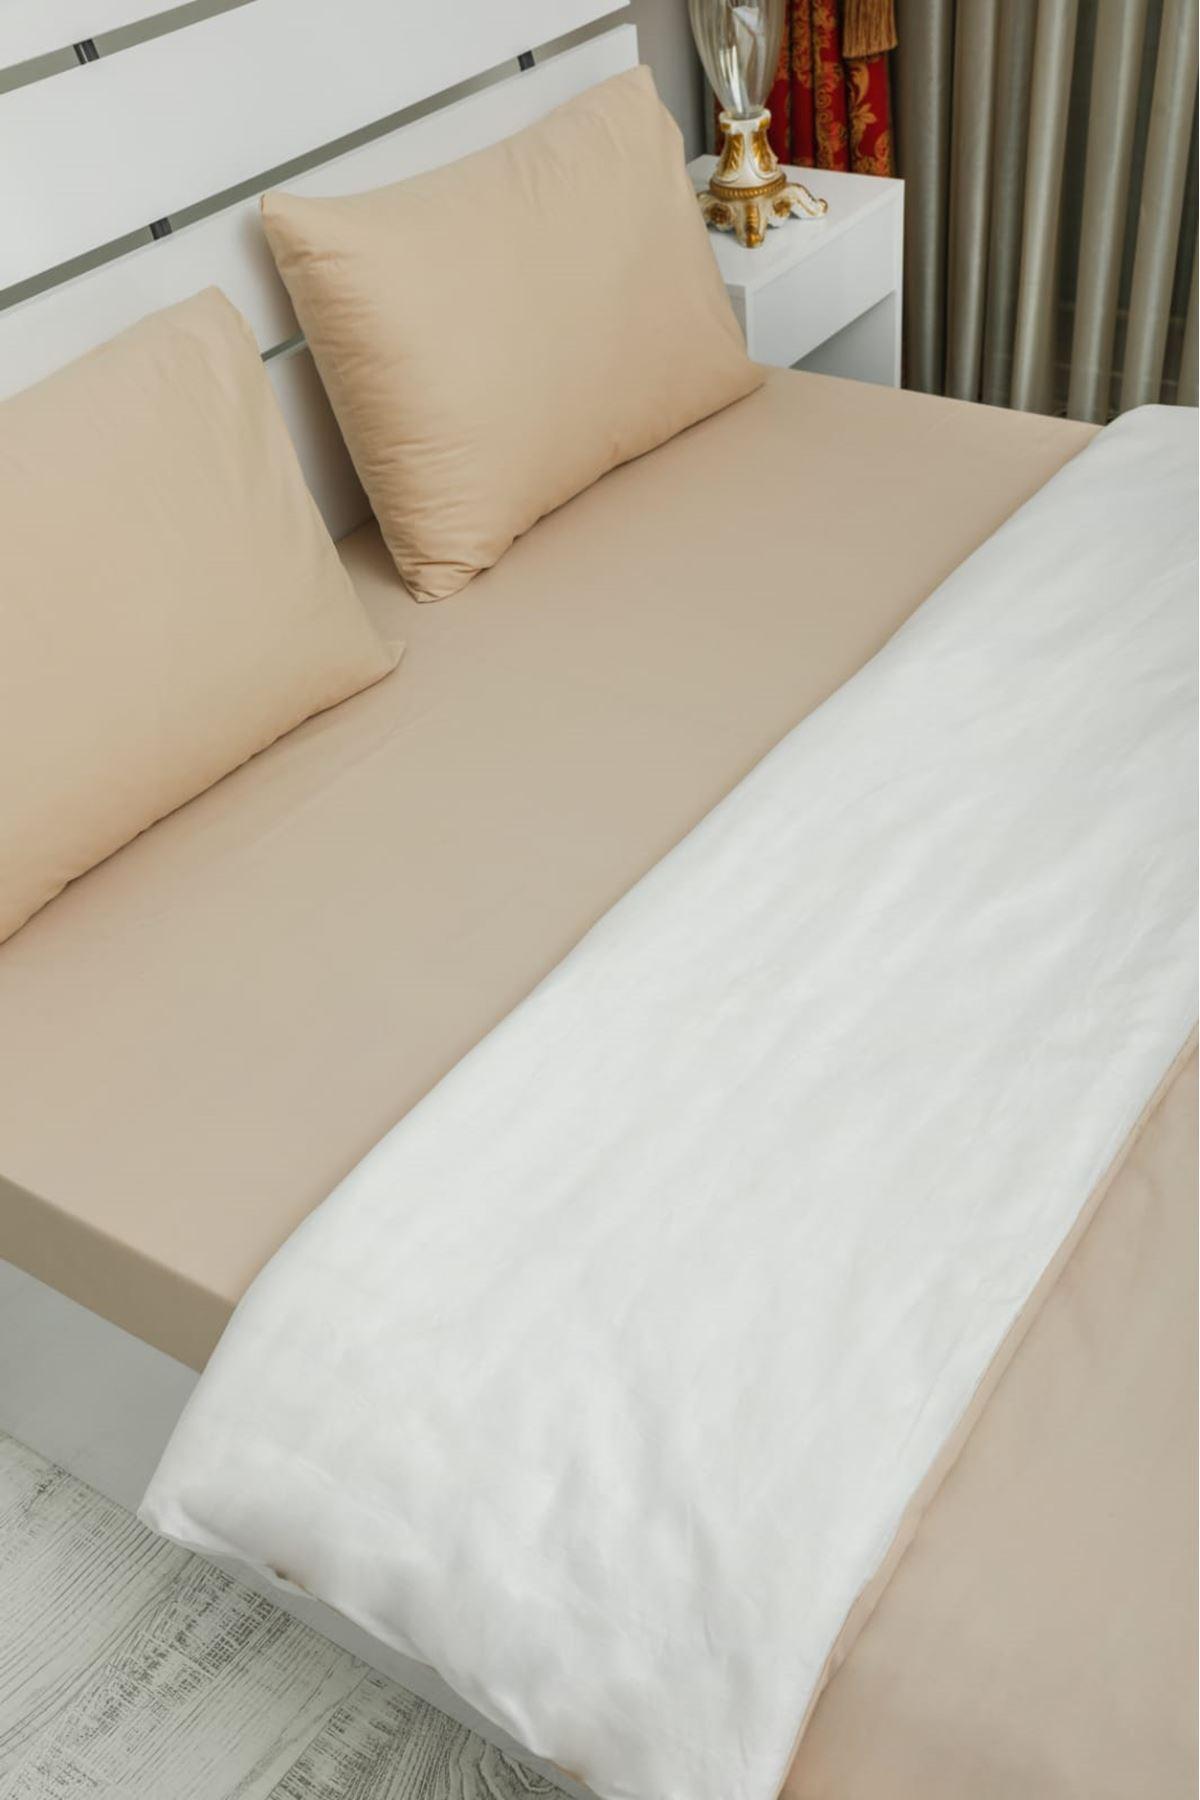 %100 ORGANİK PAMUK NEVRESİM SETİ TEK KİSİLİK cappucino*beyaz